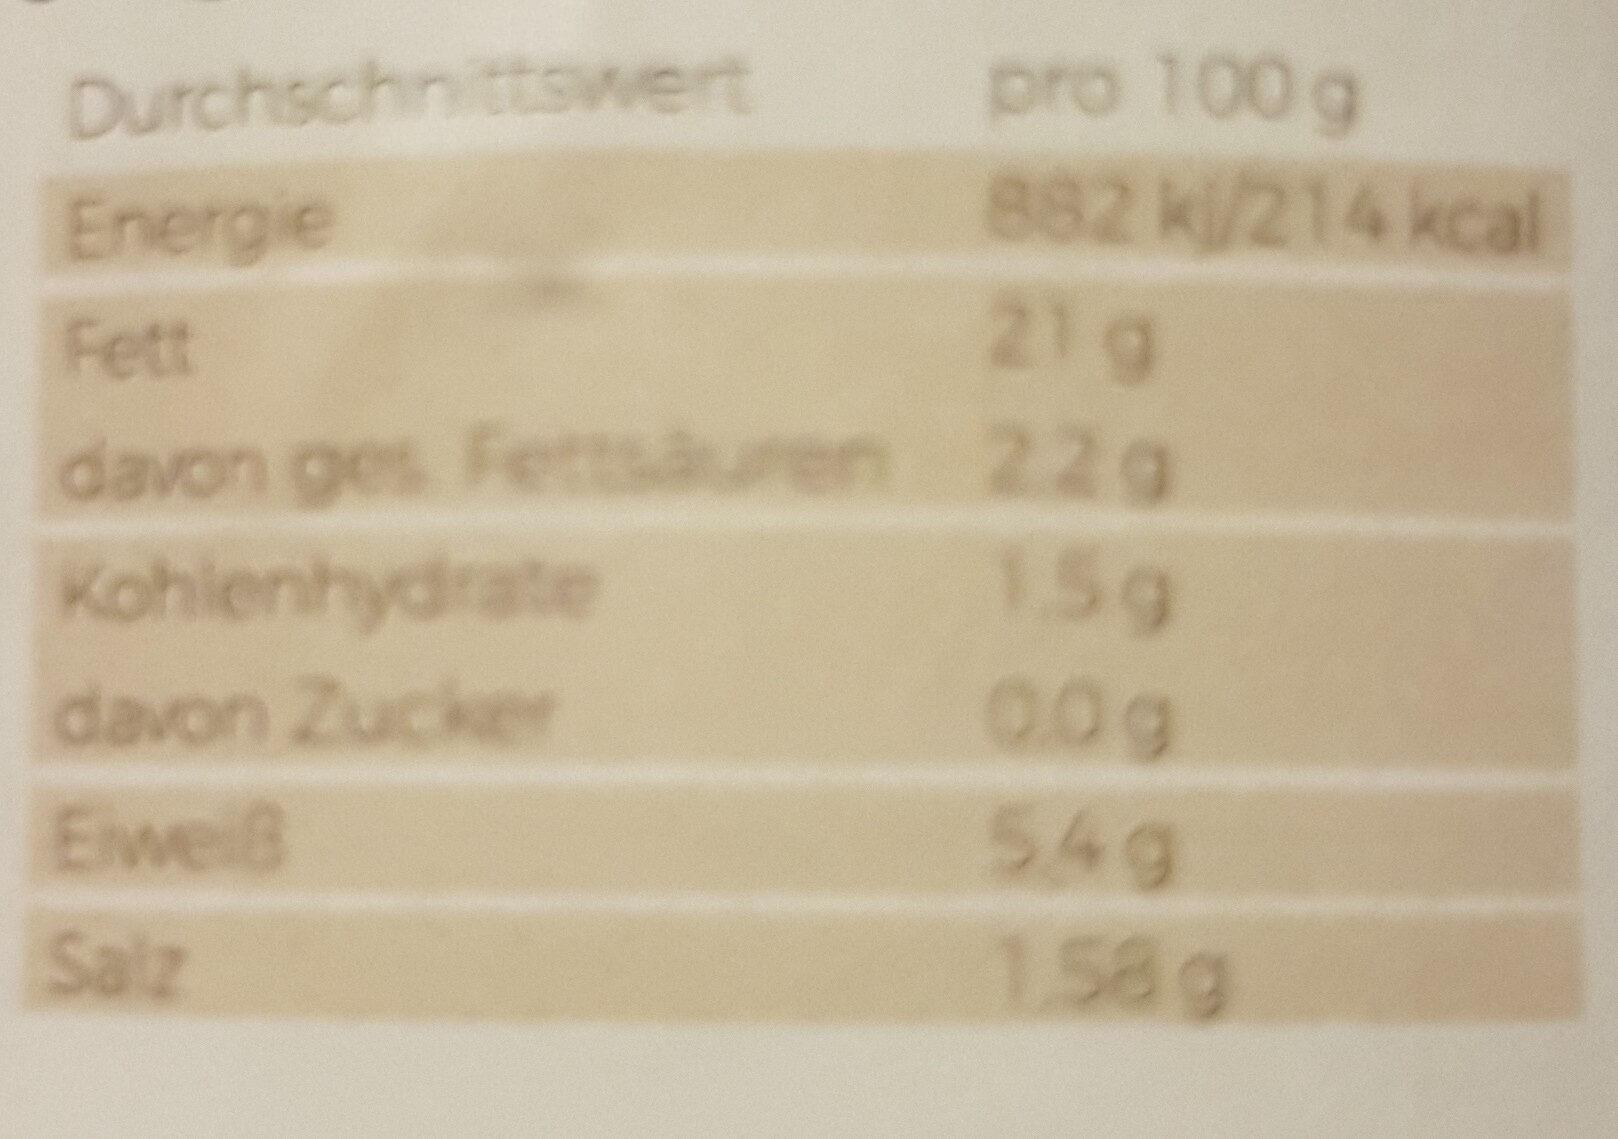 Pilzkiste Premium Austernpilzcreme - Voedingswaarden - de